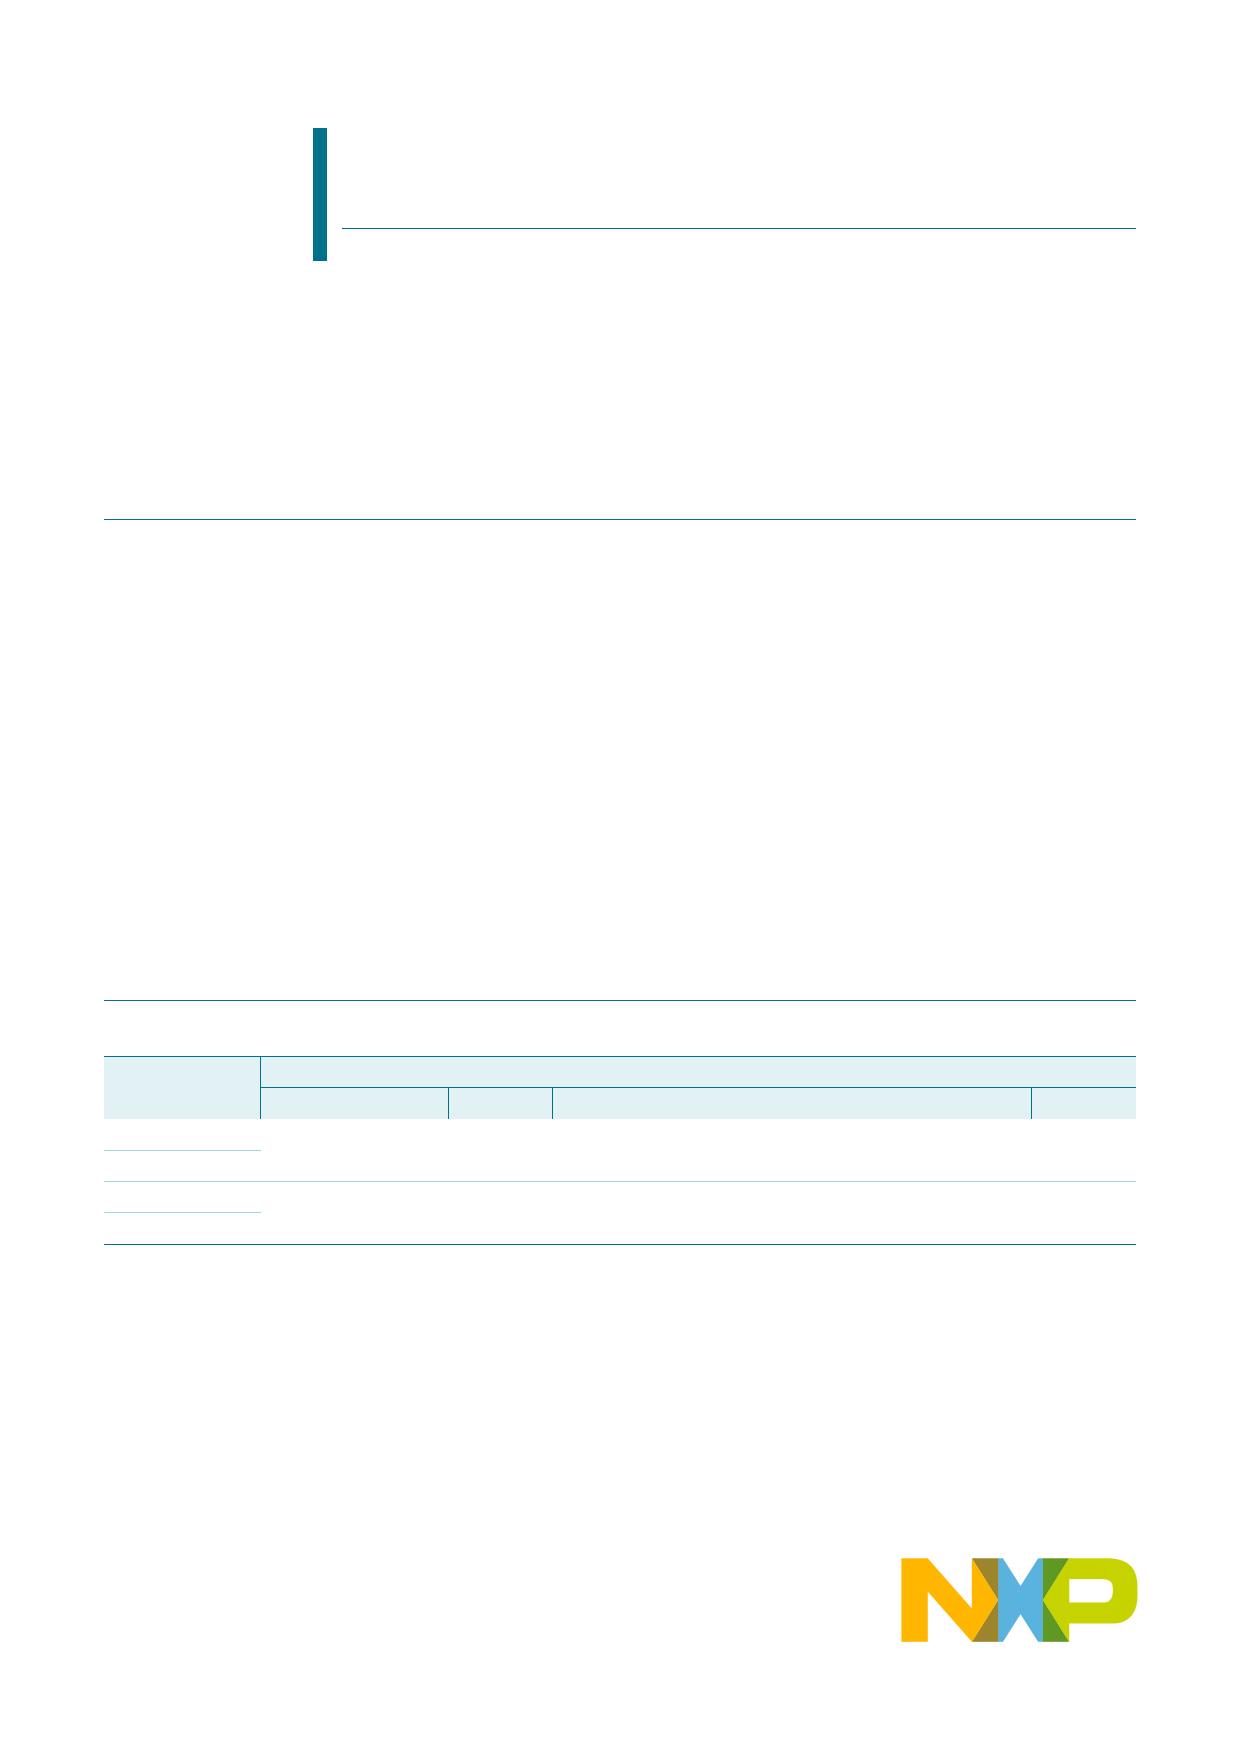 74HCT1G04GV datasheet